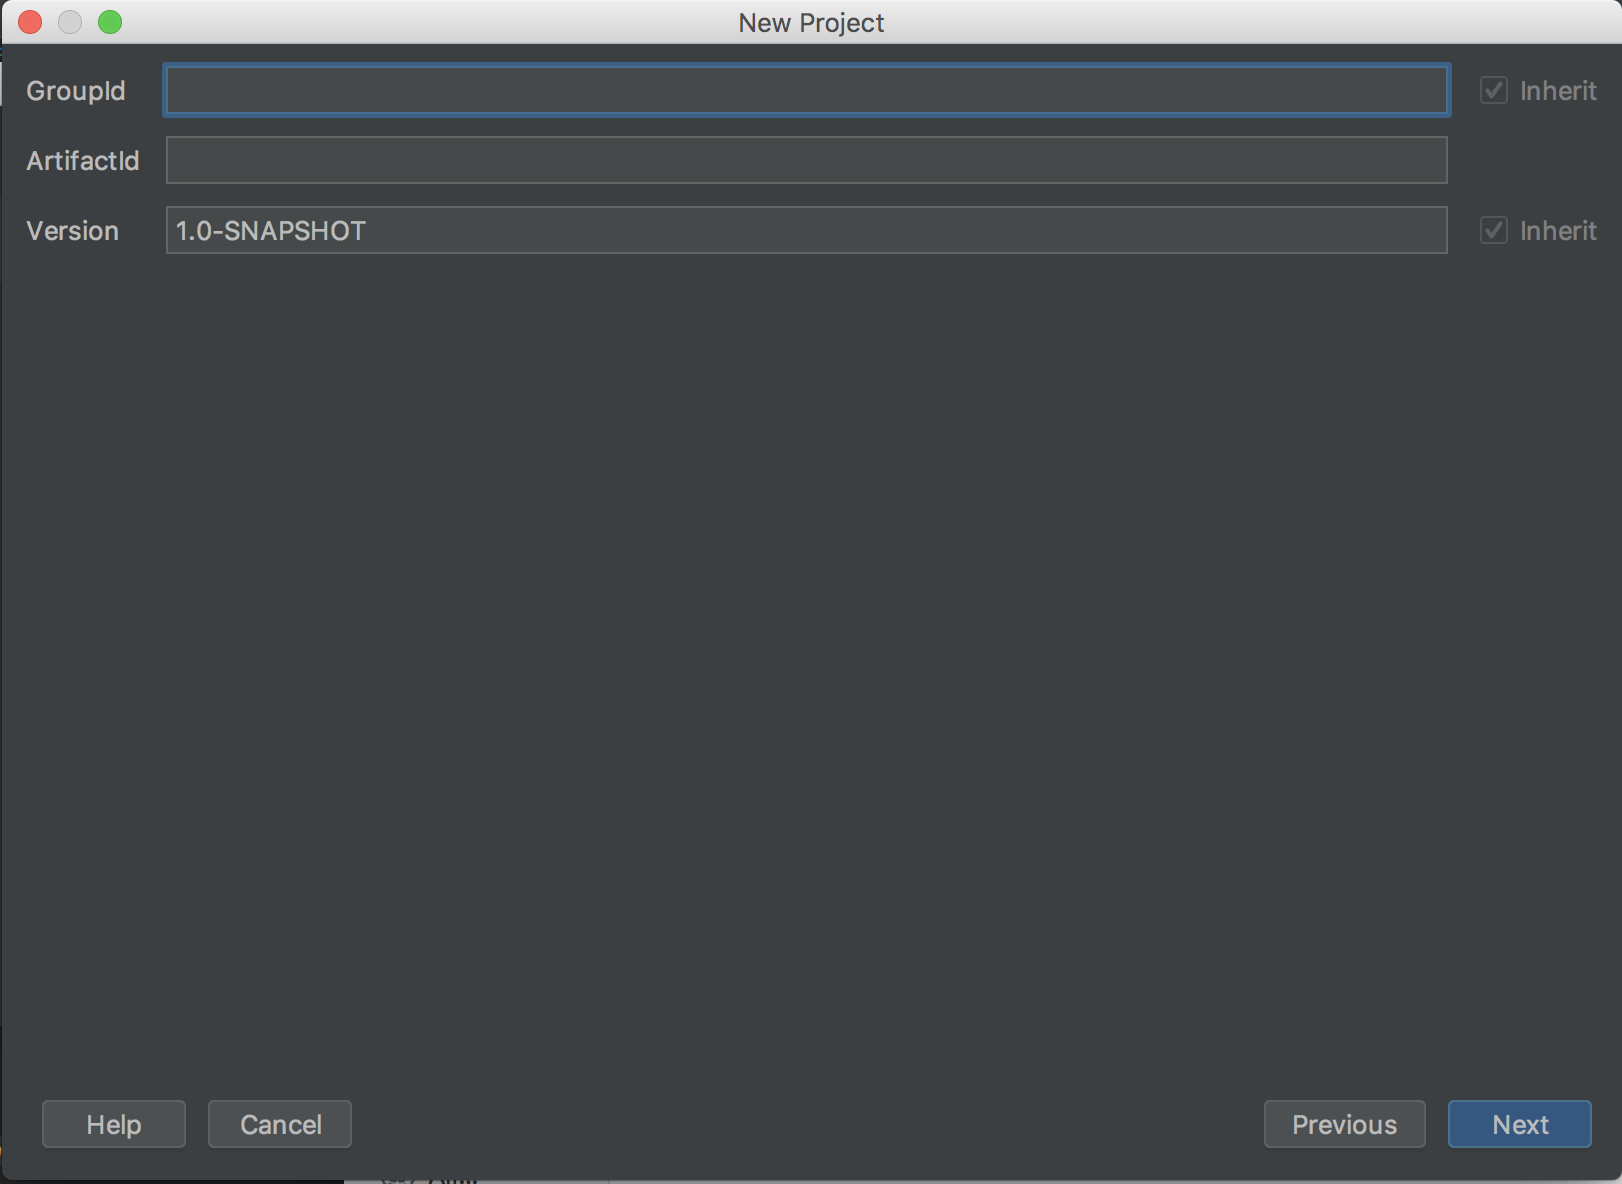 Run MXNet Java Examples Using the IntelliJ IDE (macOS